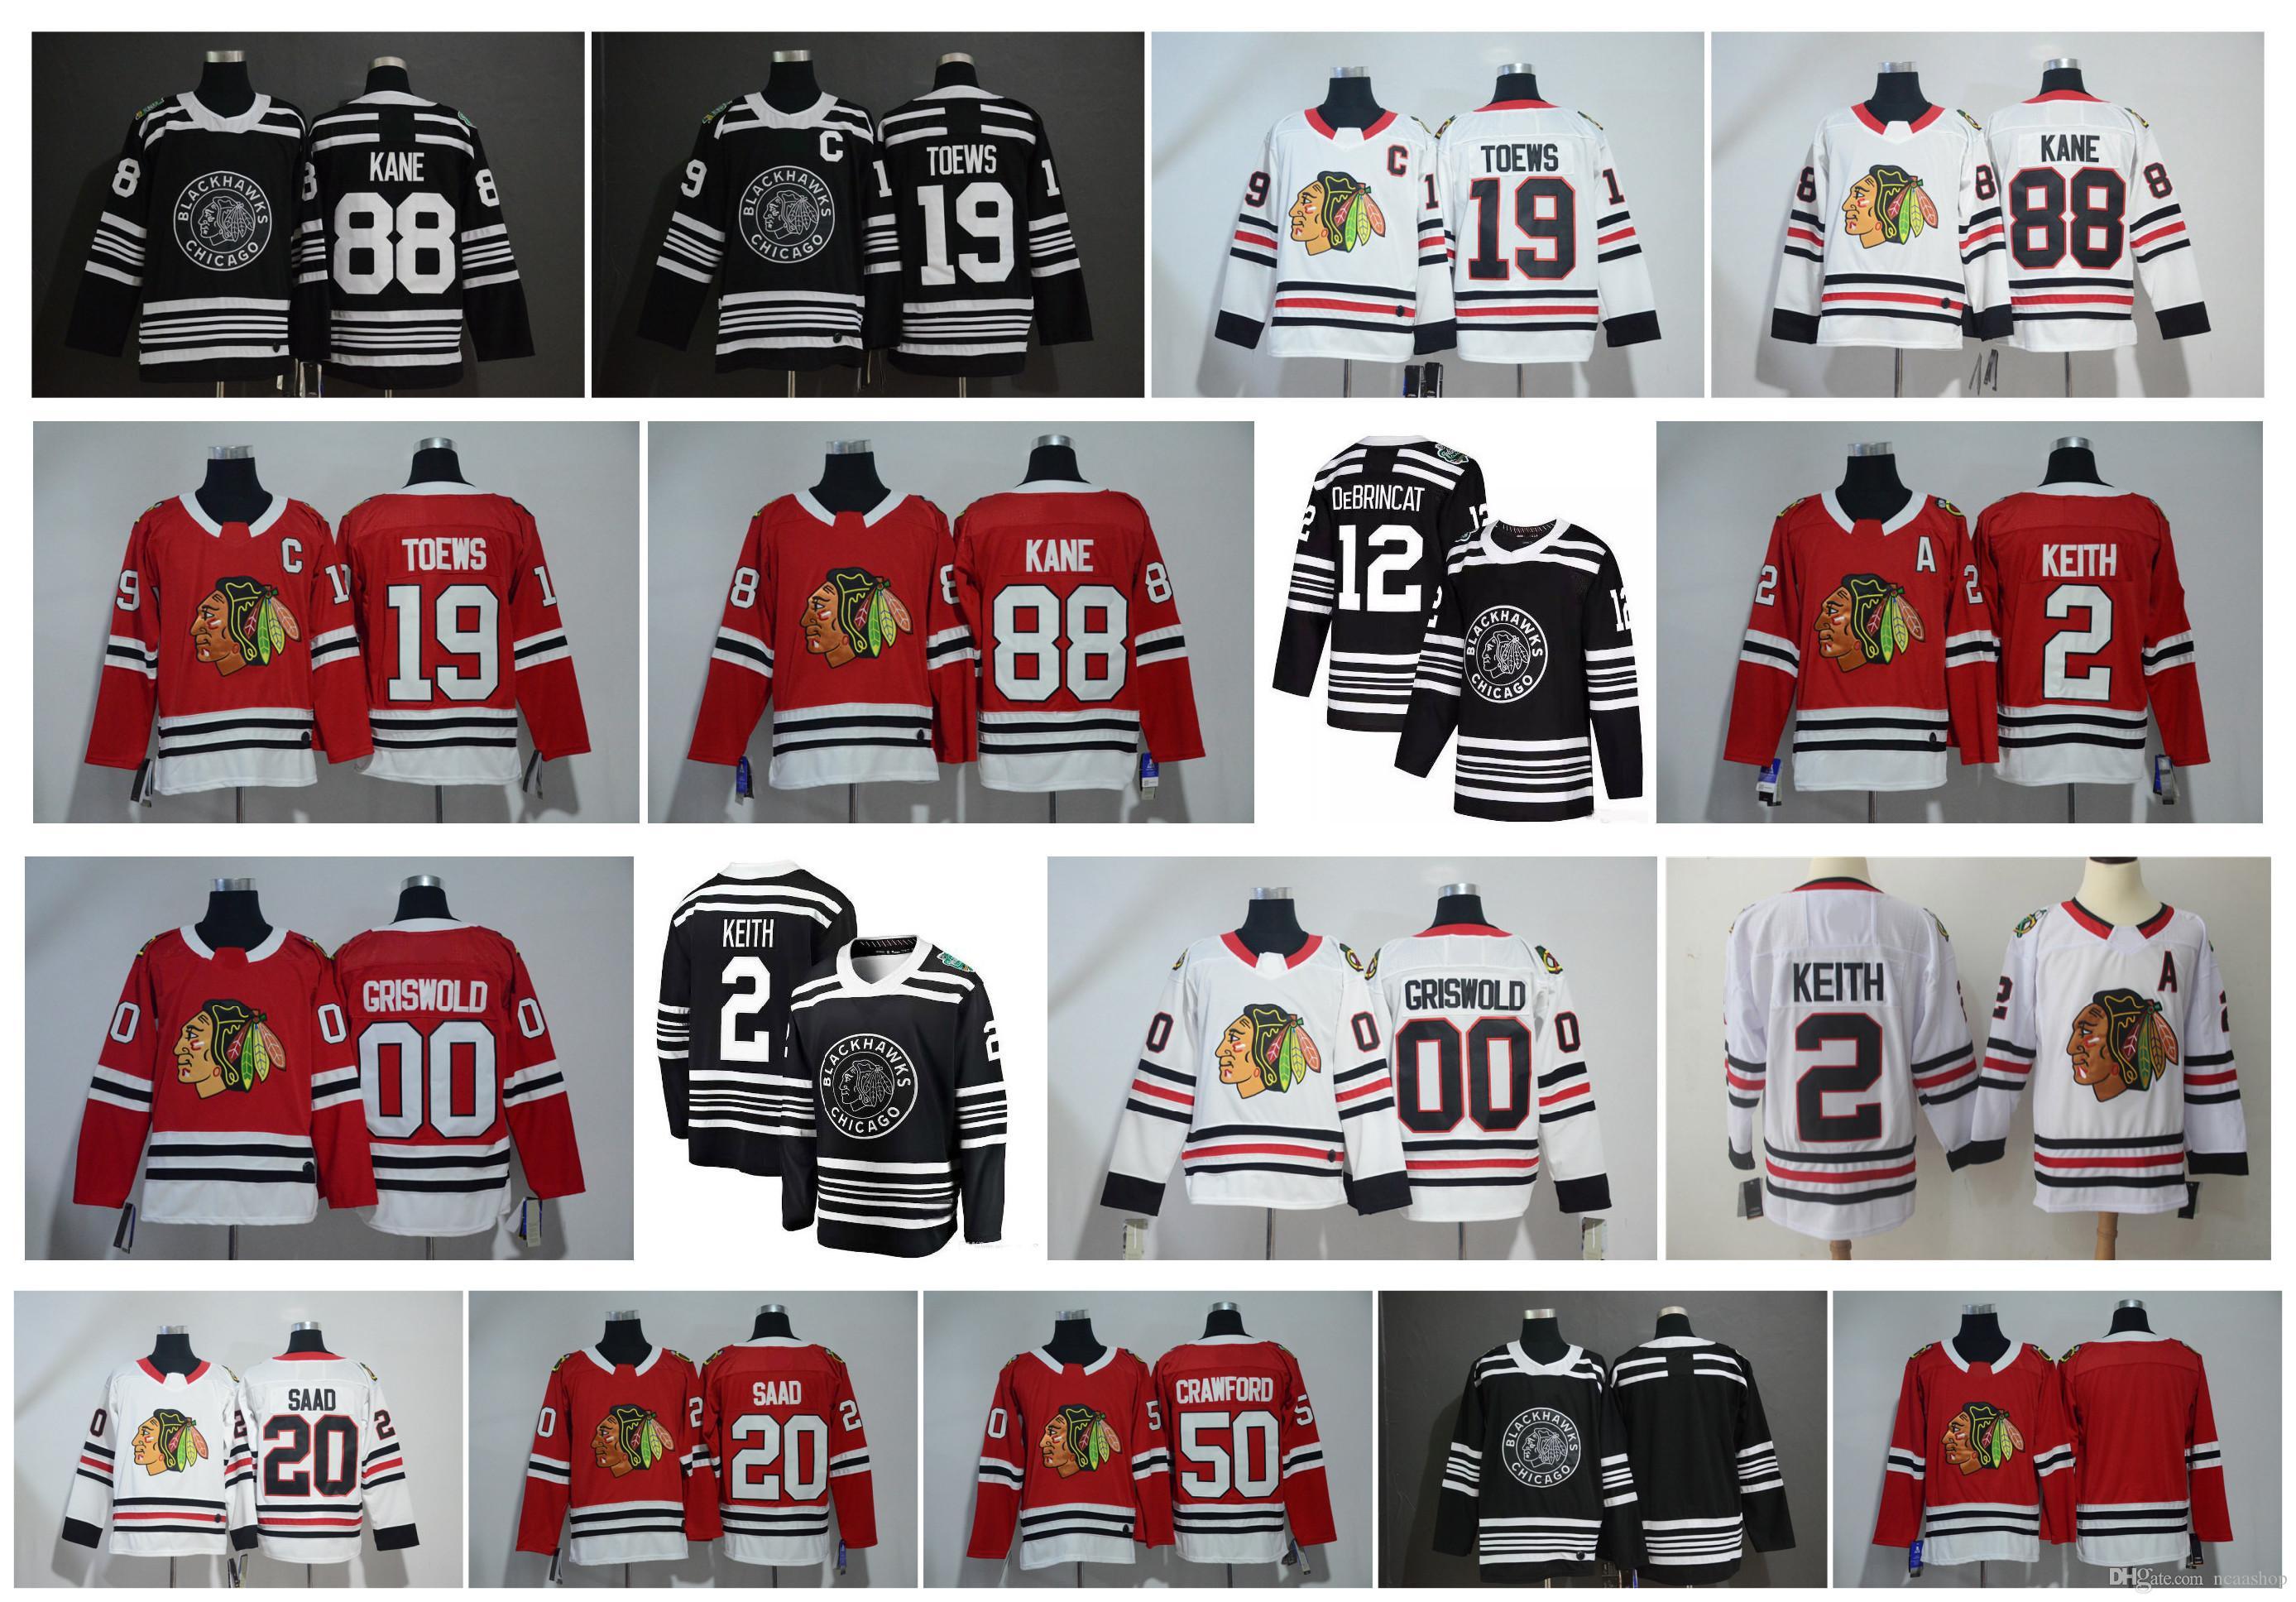 68b1e758 ... discount code for 2019 2019 winter classic nhl chicago blackhawks jersey  jonathan toews patrick kane corey